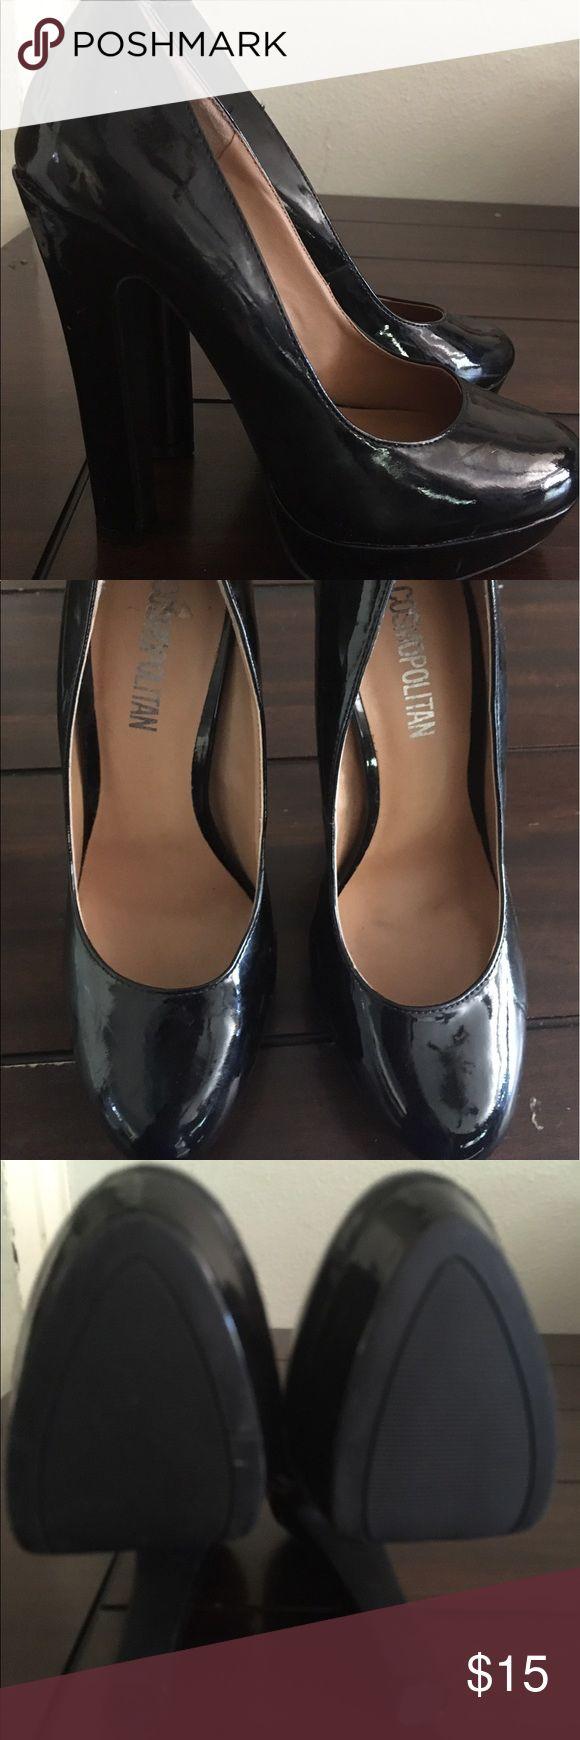 NWT cosmopolitan size 7 black  4 inch heels NWT black size 7 cosmopolitan stacked heel 4 inch pumps. cosmopolitan Shoes Heels